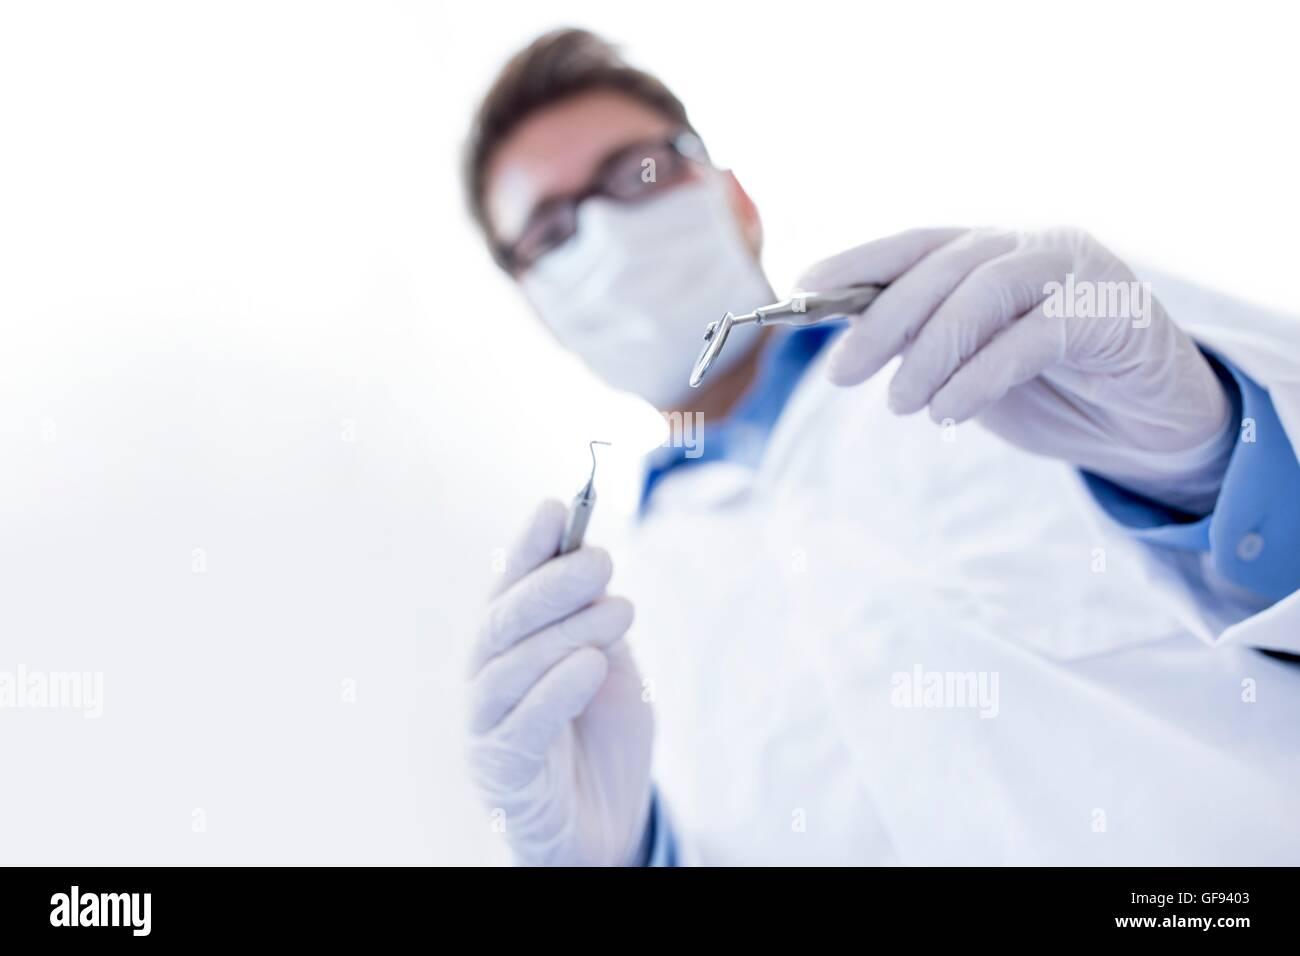 MODEL RELEASED. Dentist holding angled mirror. - Stock Image